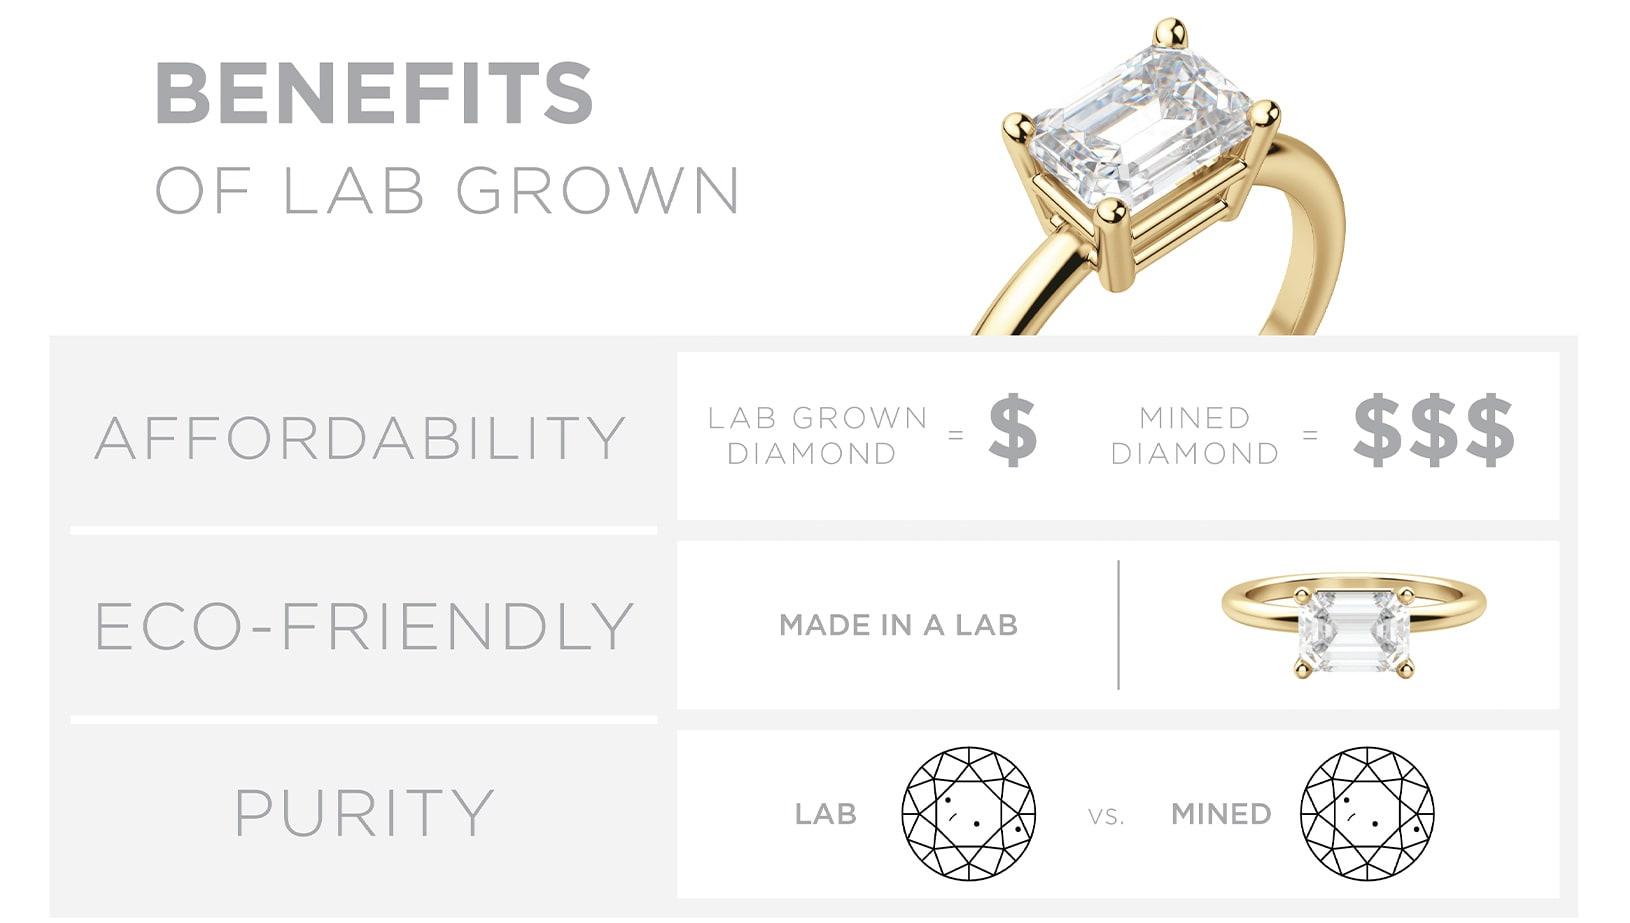 Lab grown diamonds vs mined diamonds